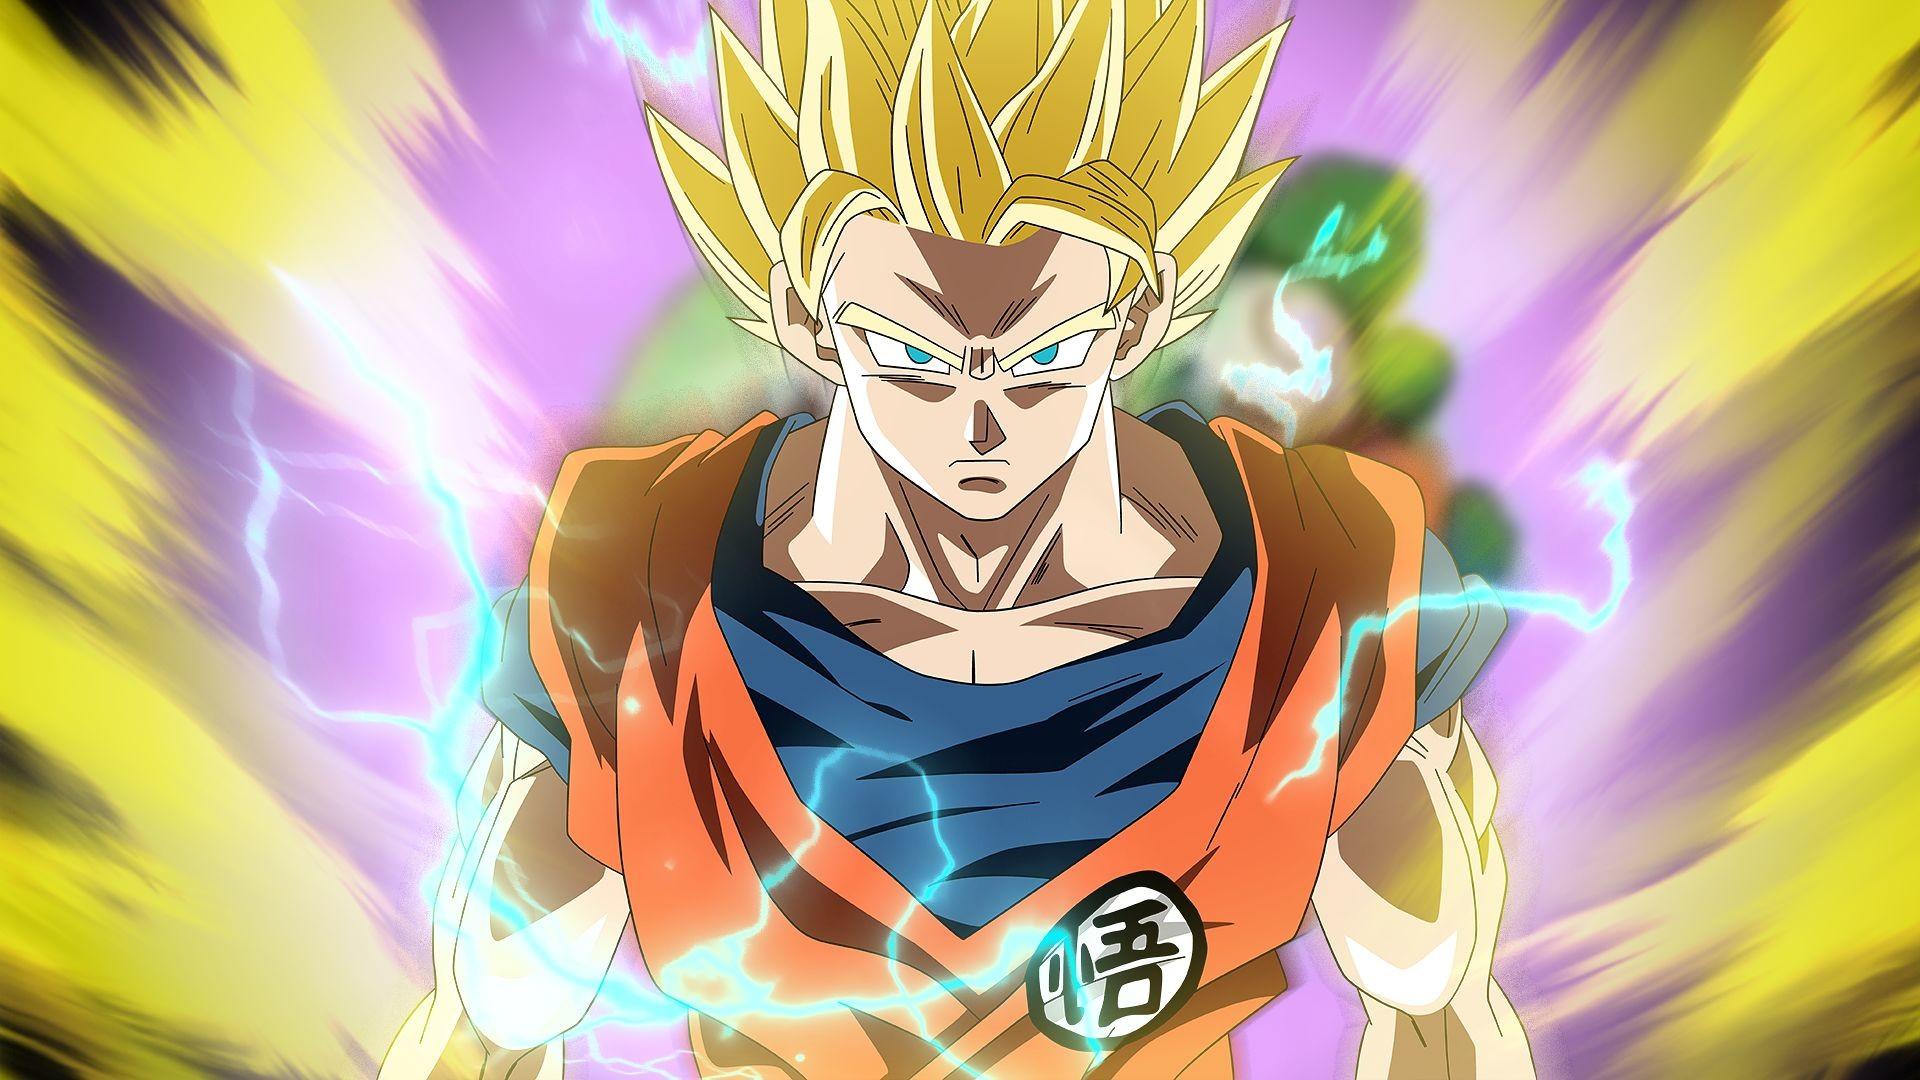 Dragon Ball Z Goku Super Saiyan 10 3d Wallpapers Full HD with High .